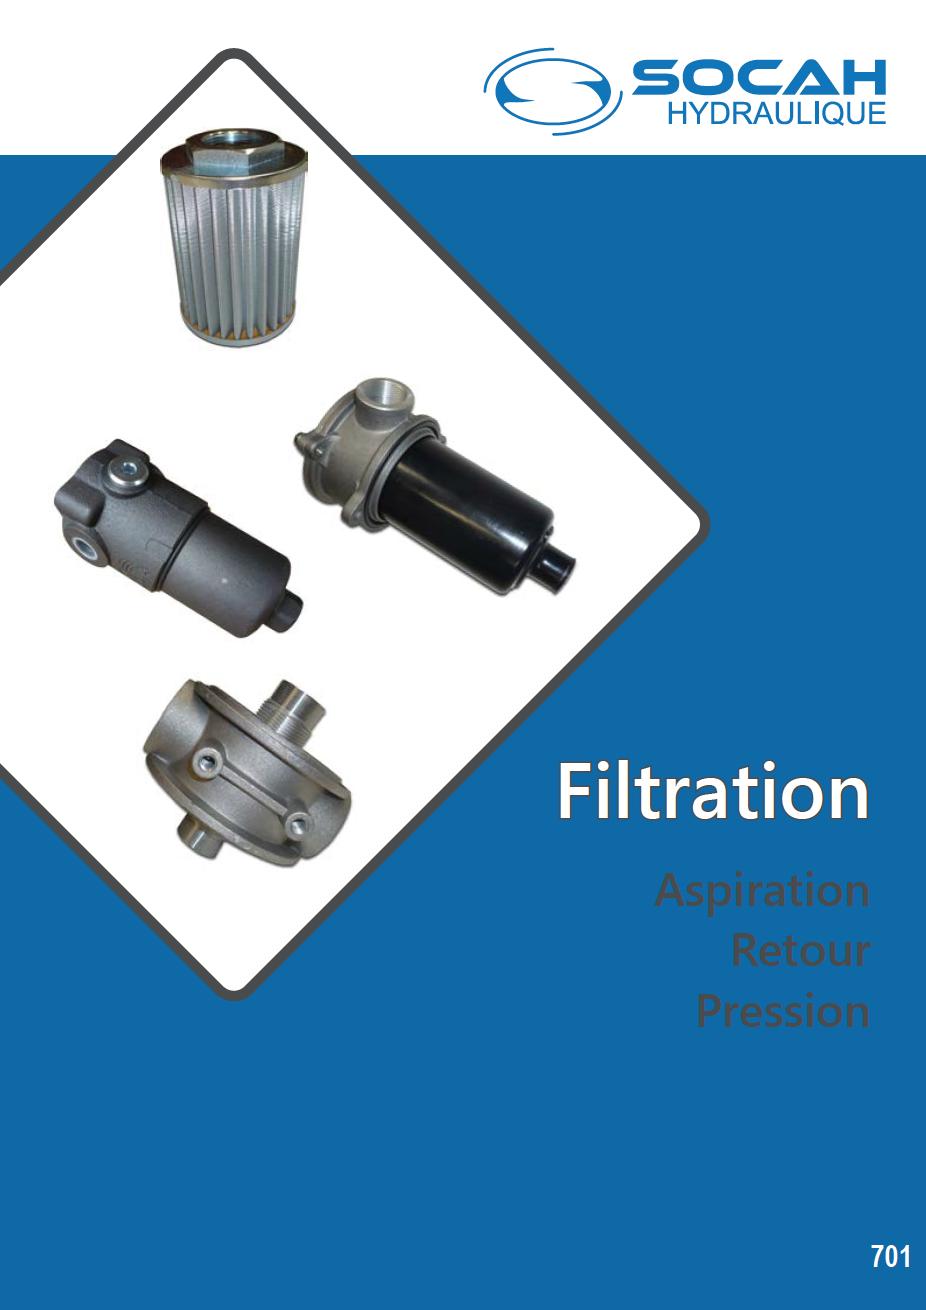 Fiche technique filtration